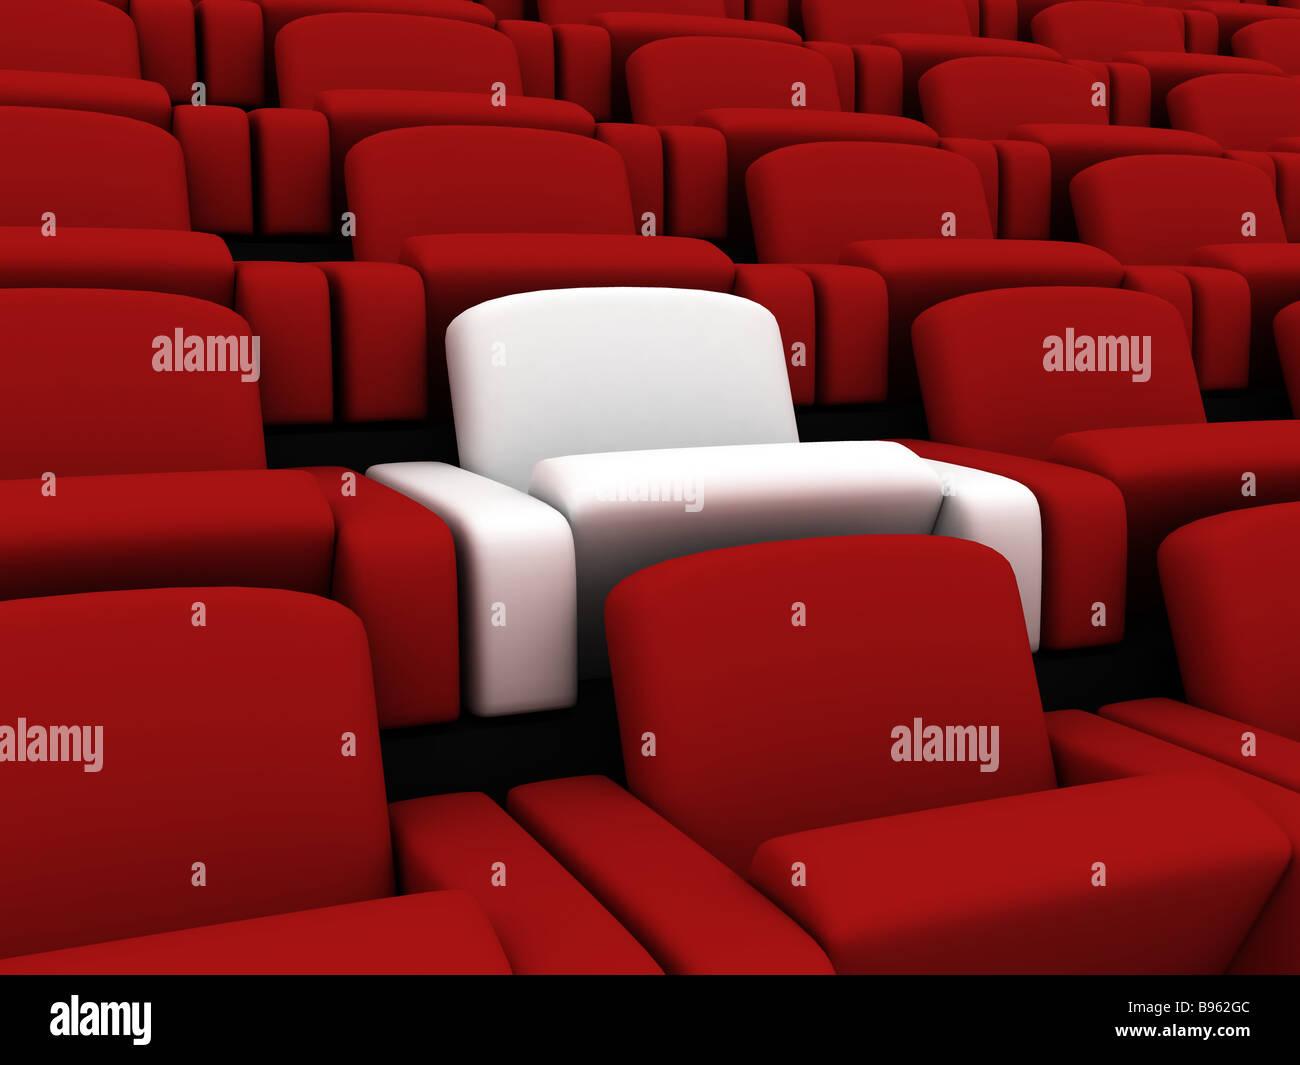 cinema seats - Stock Image